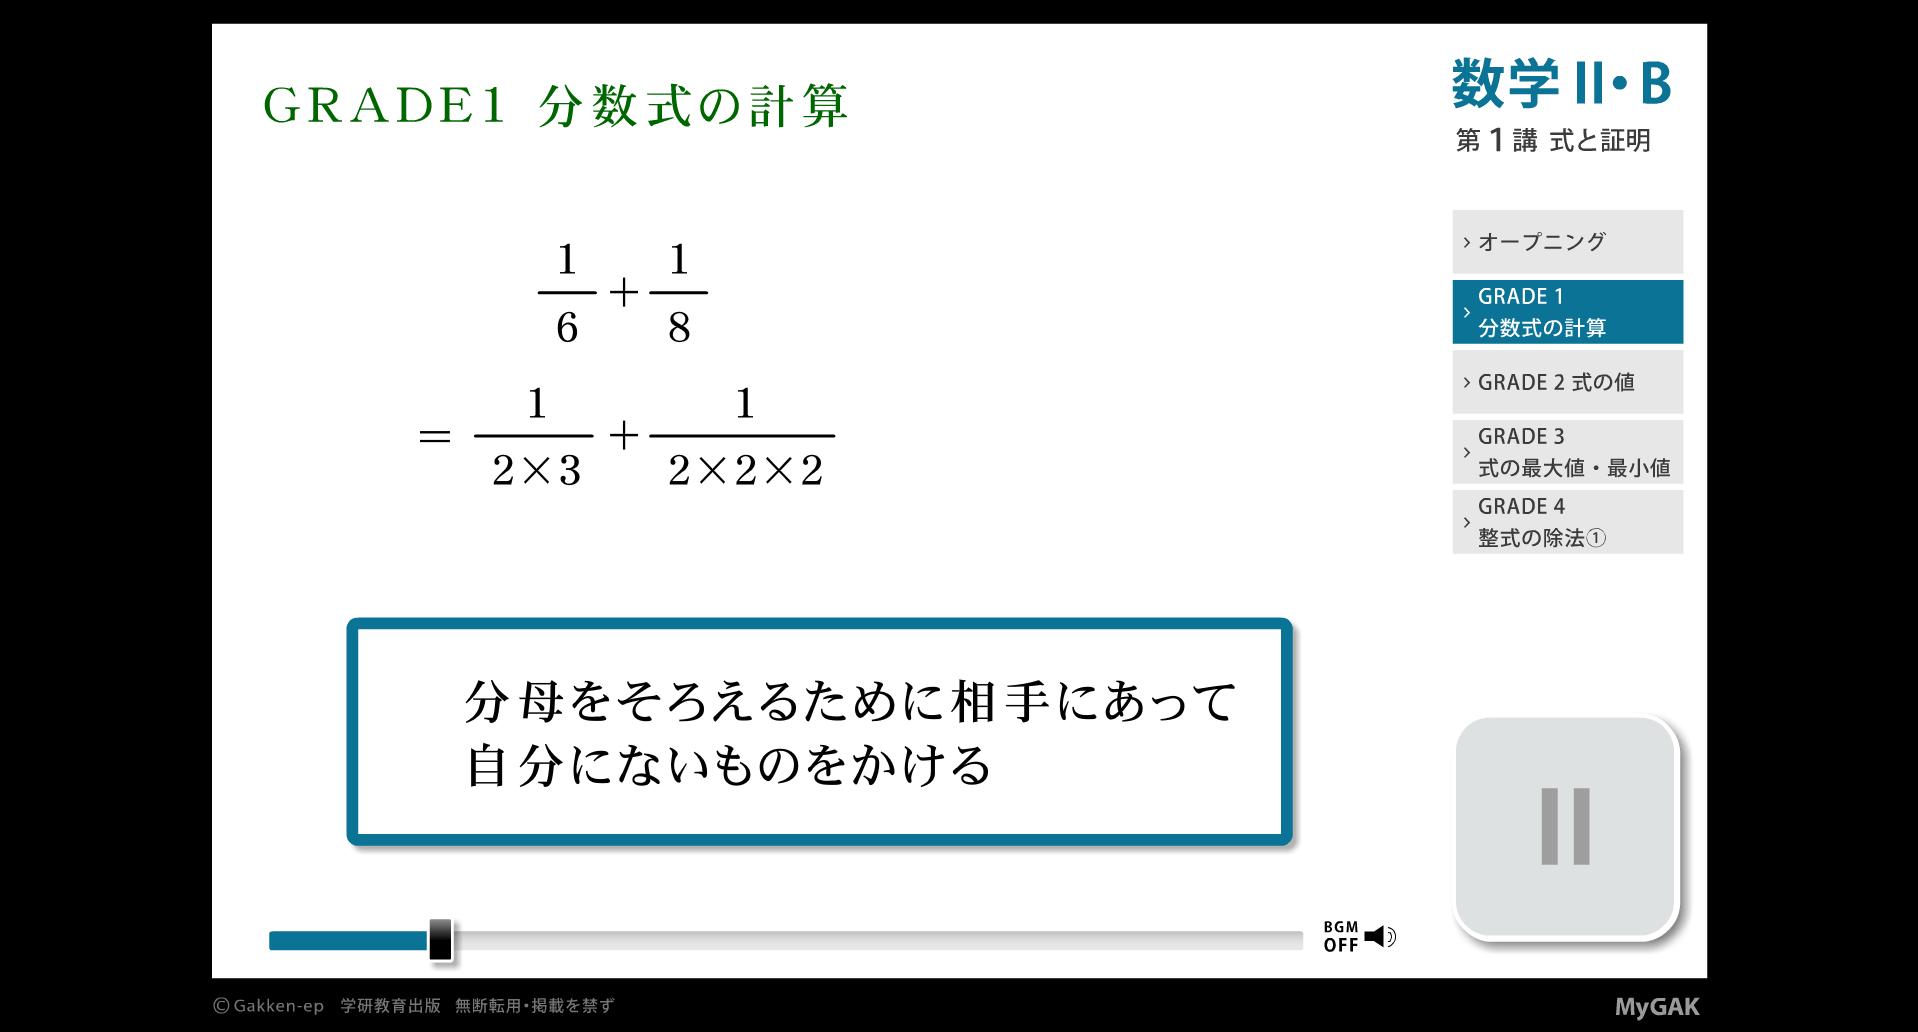 G-5 高校学力初級 数学Ⅱ・B